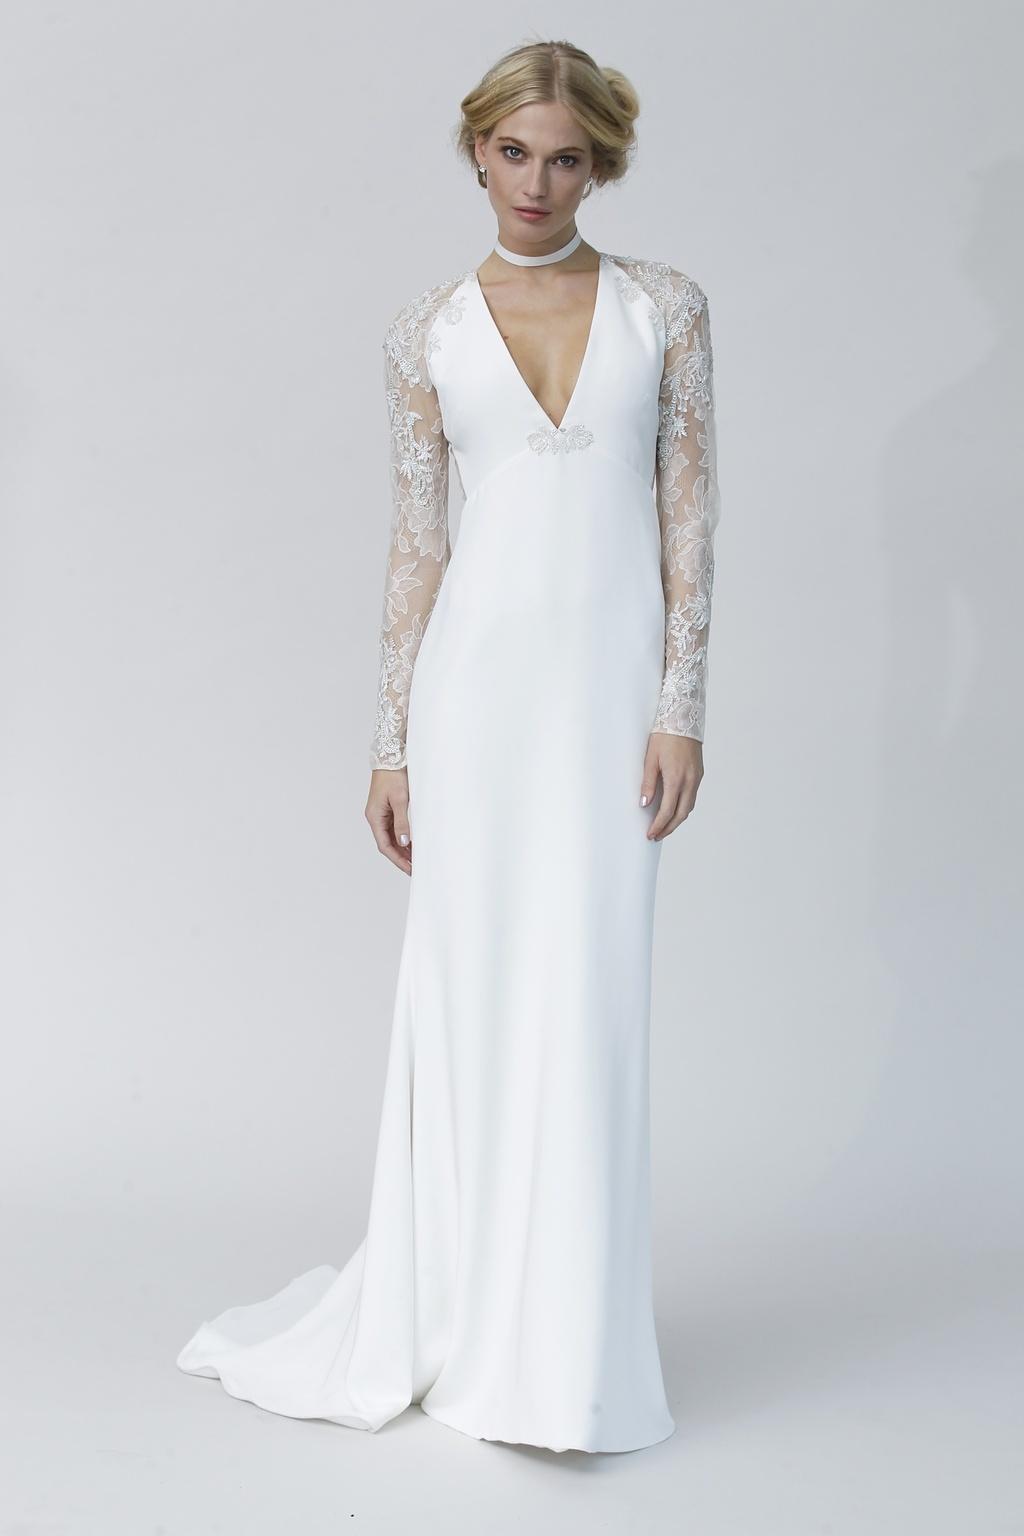 Donatella-wedding-dress-by-rivini-fall-2014-bridal.full